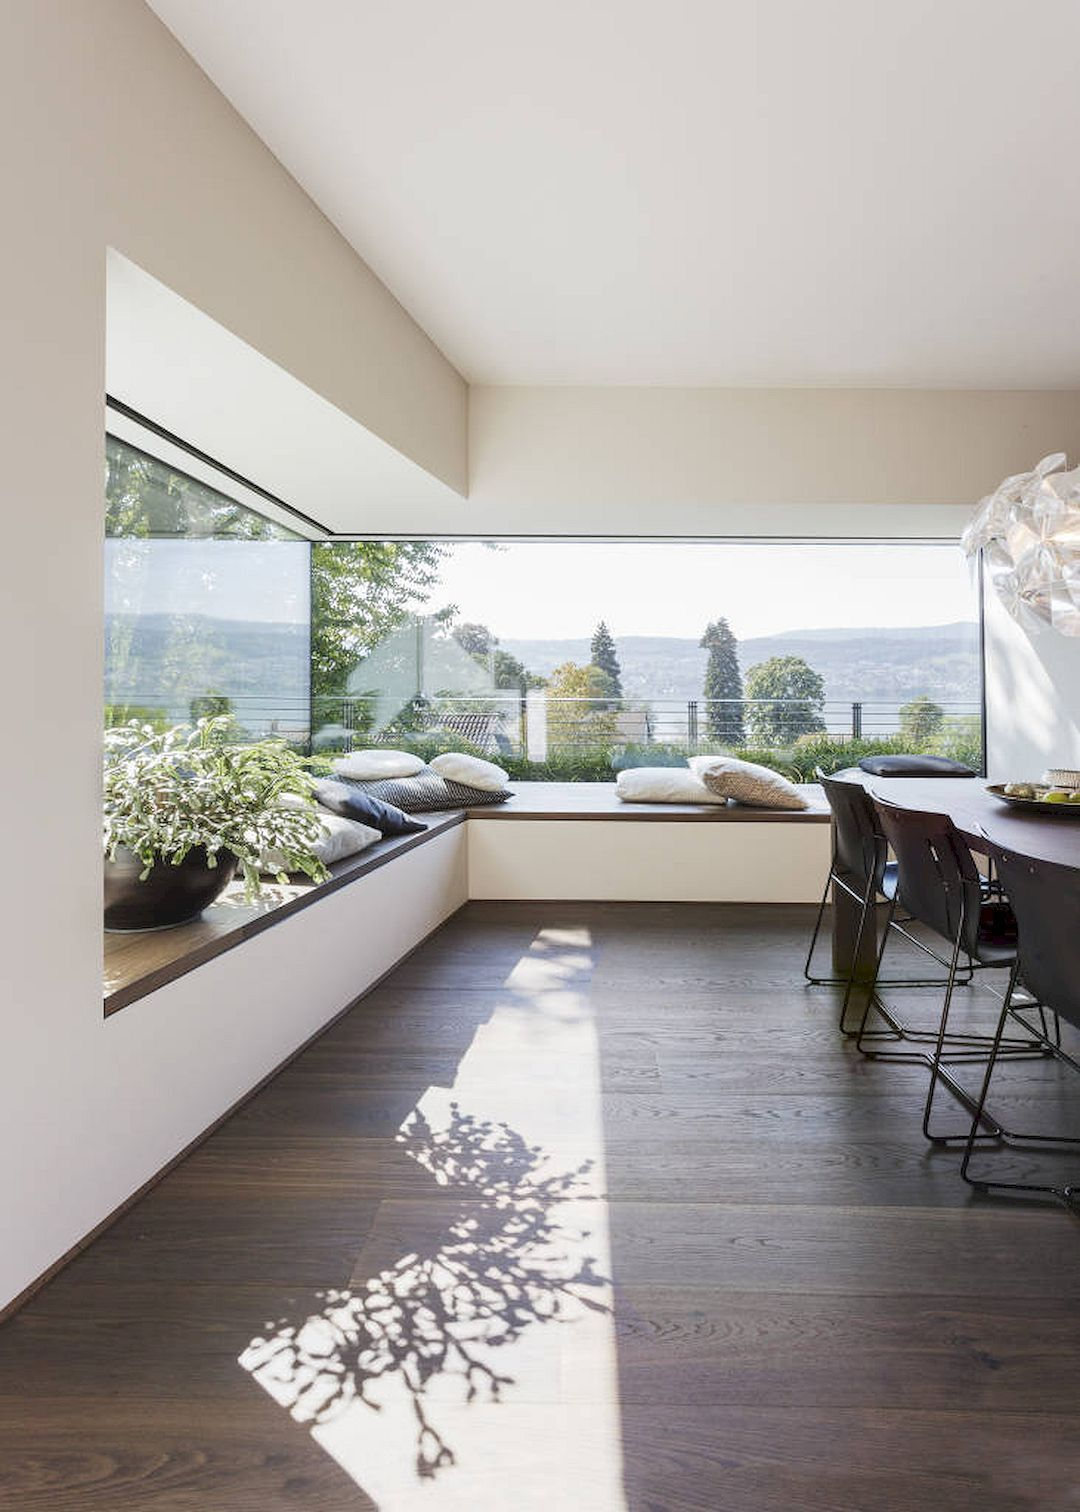 Window house design ideas  best interior design inspirations   photos  interior